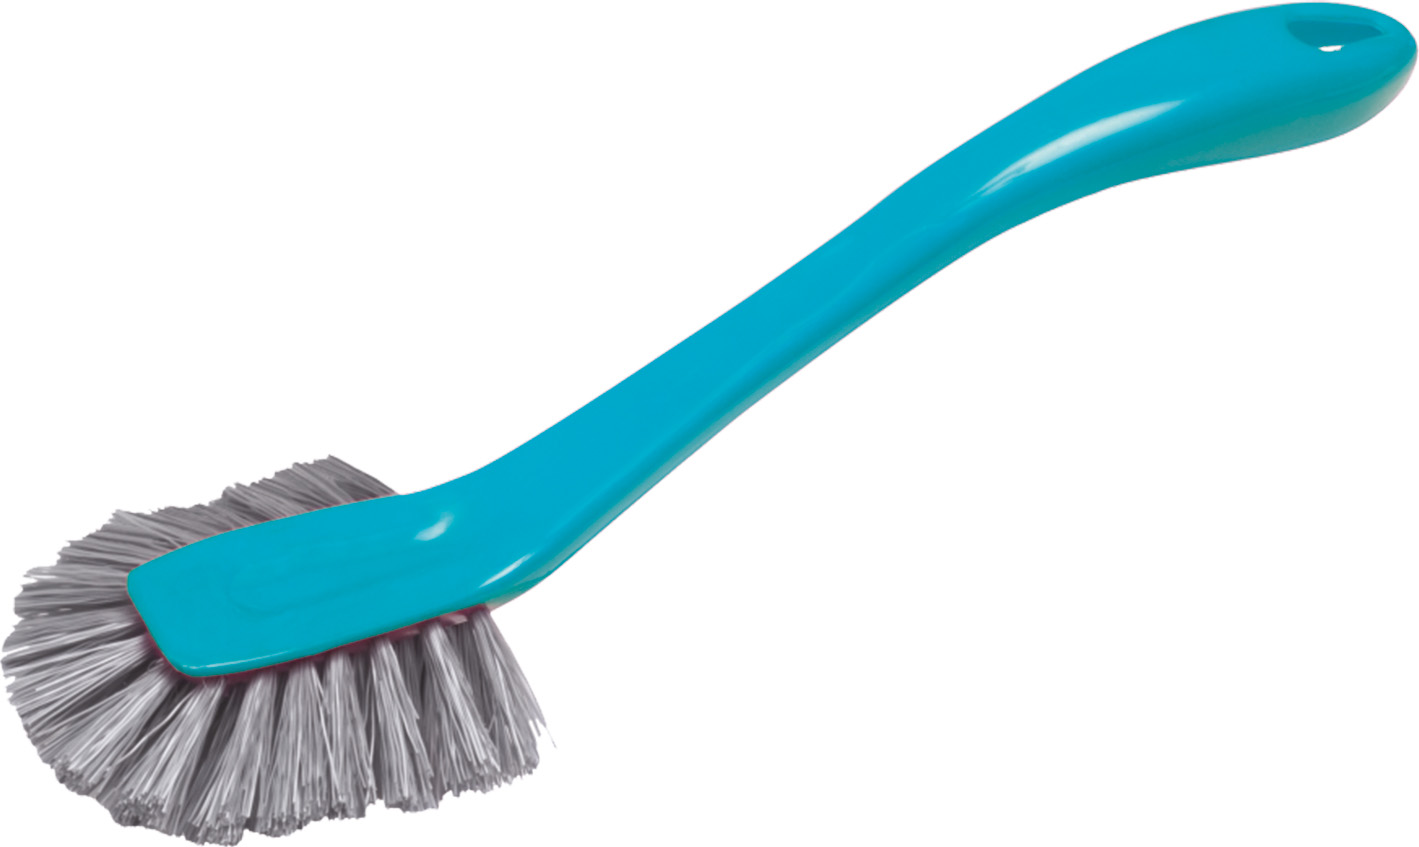 02311 - Geschirrspülbürste mit ovalem Kopf, farbig sortiert